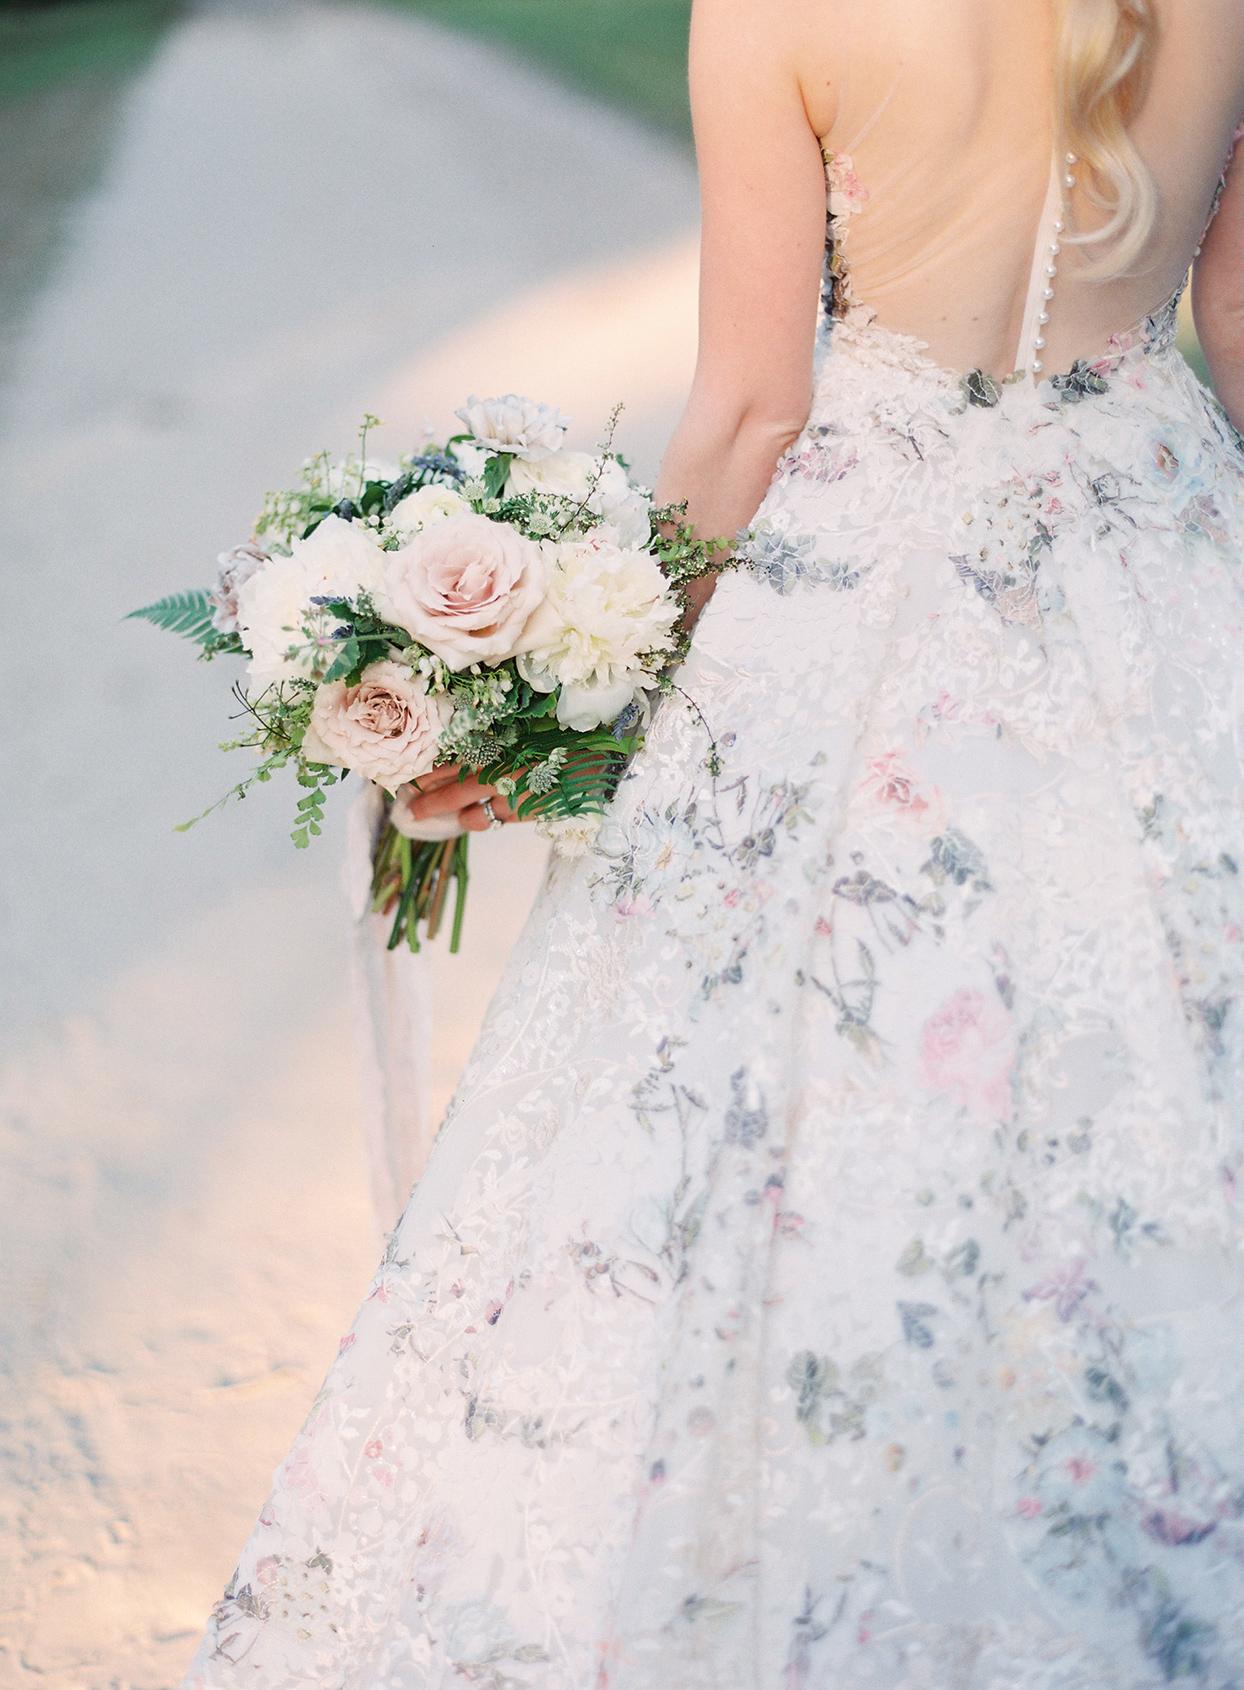 chelsea john bride's wedding bouquet pastel blue and pink